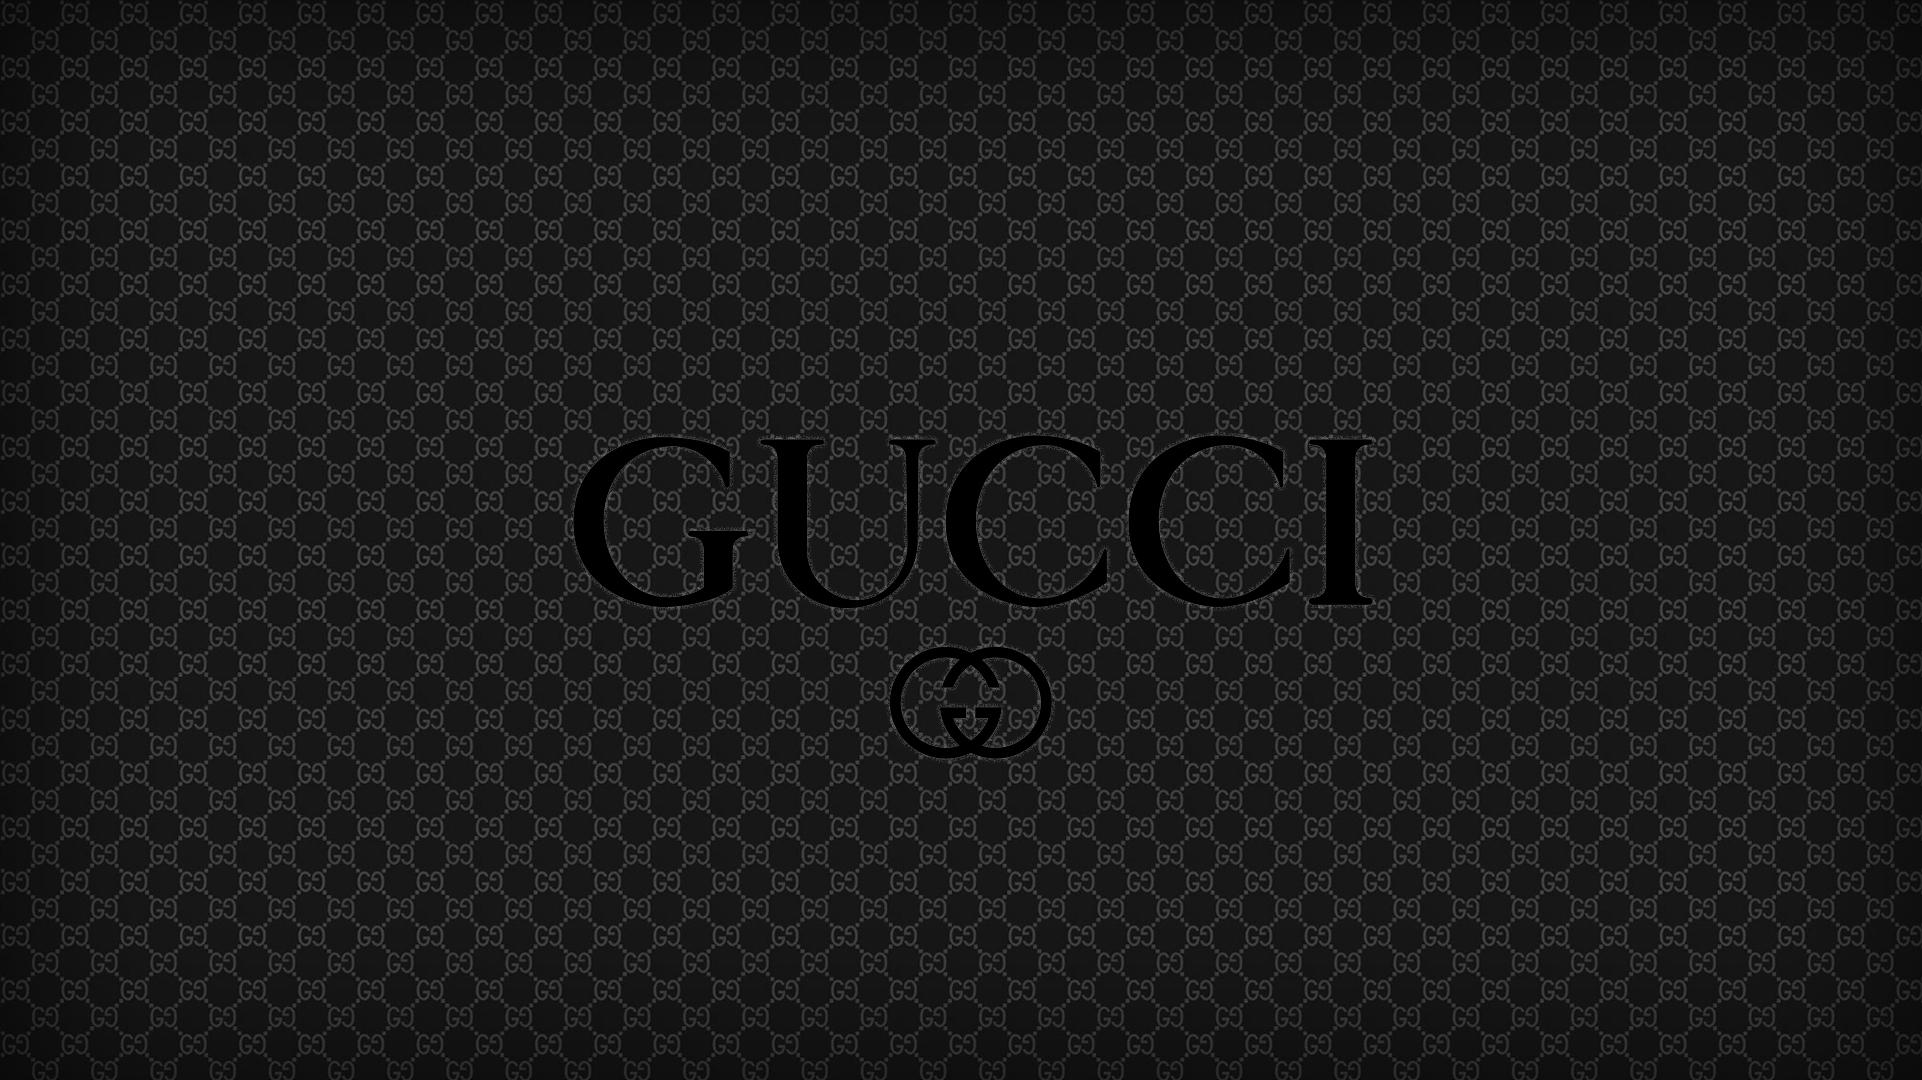 2560x1440 Black Gucci Logo Brand 1440p Resolution